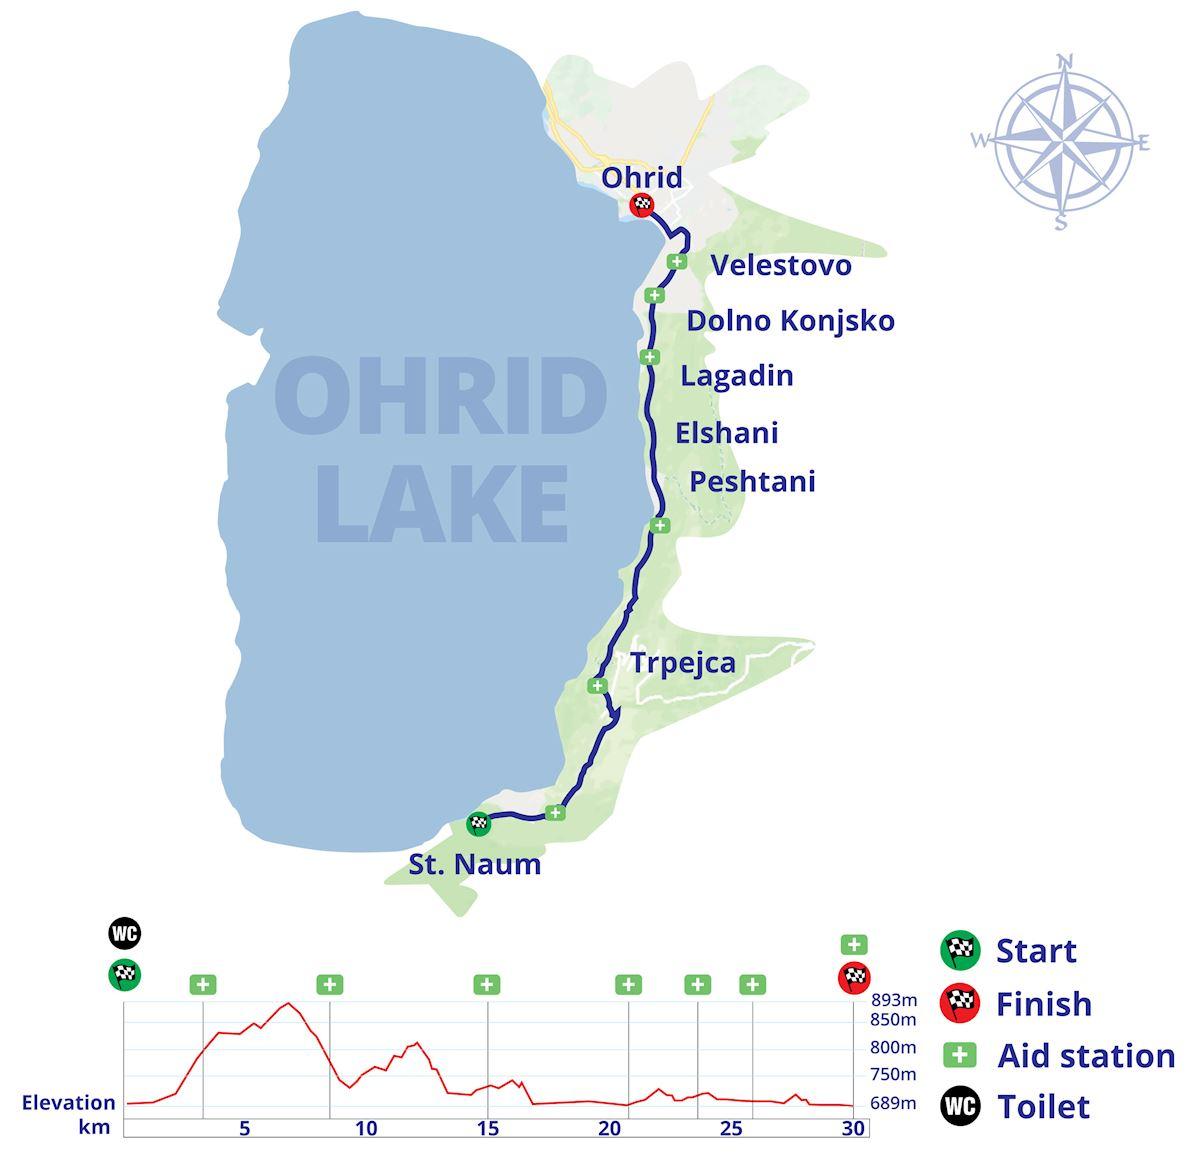 International Athletic Marathon Ohrid MAPA DEL RECORRIDO DE